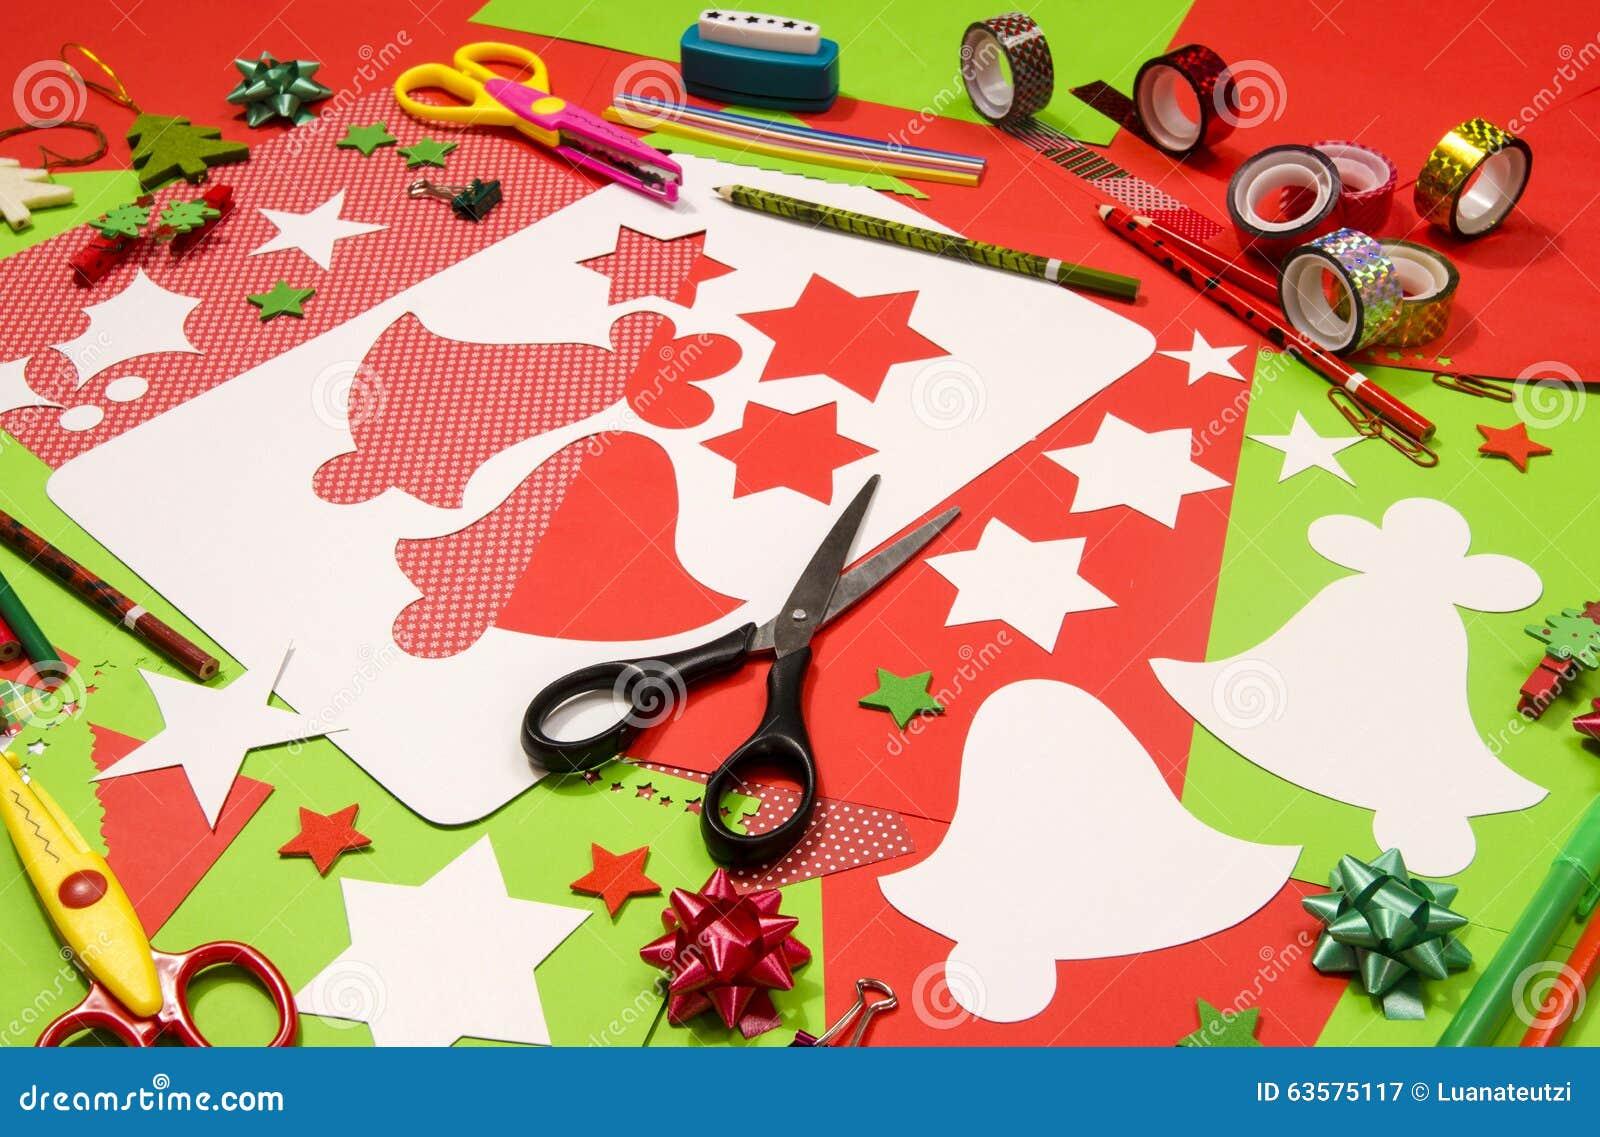 Craft Supplies Christmas Part - 33: Bell Cardboard Christmas Craft ...